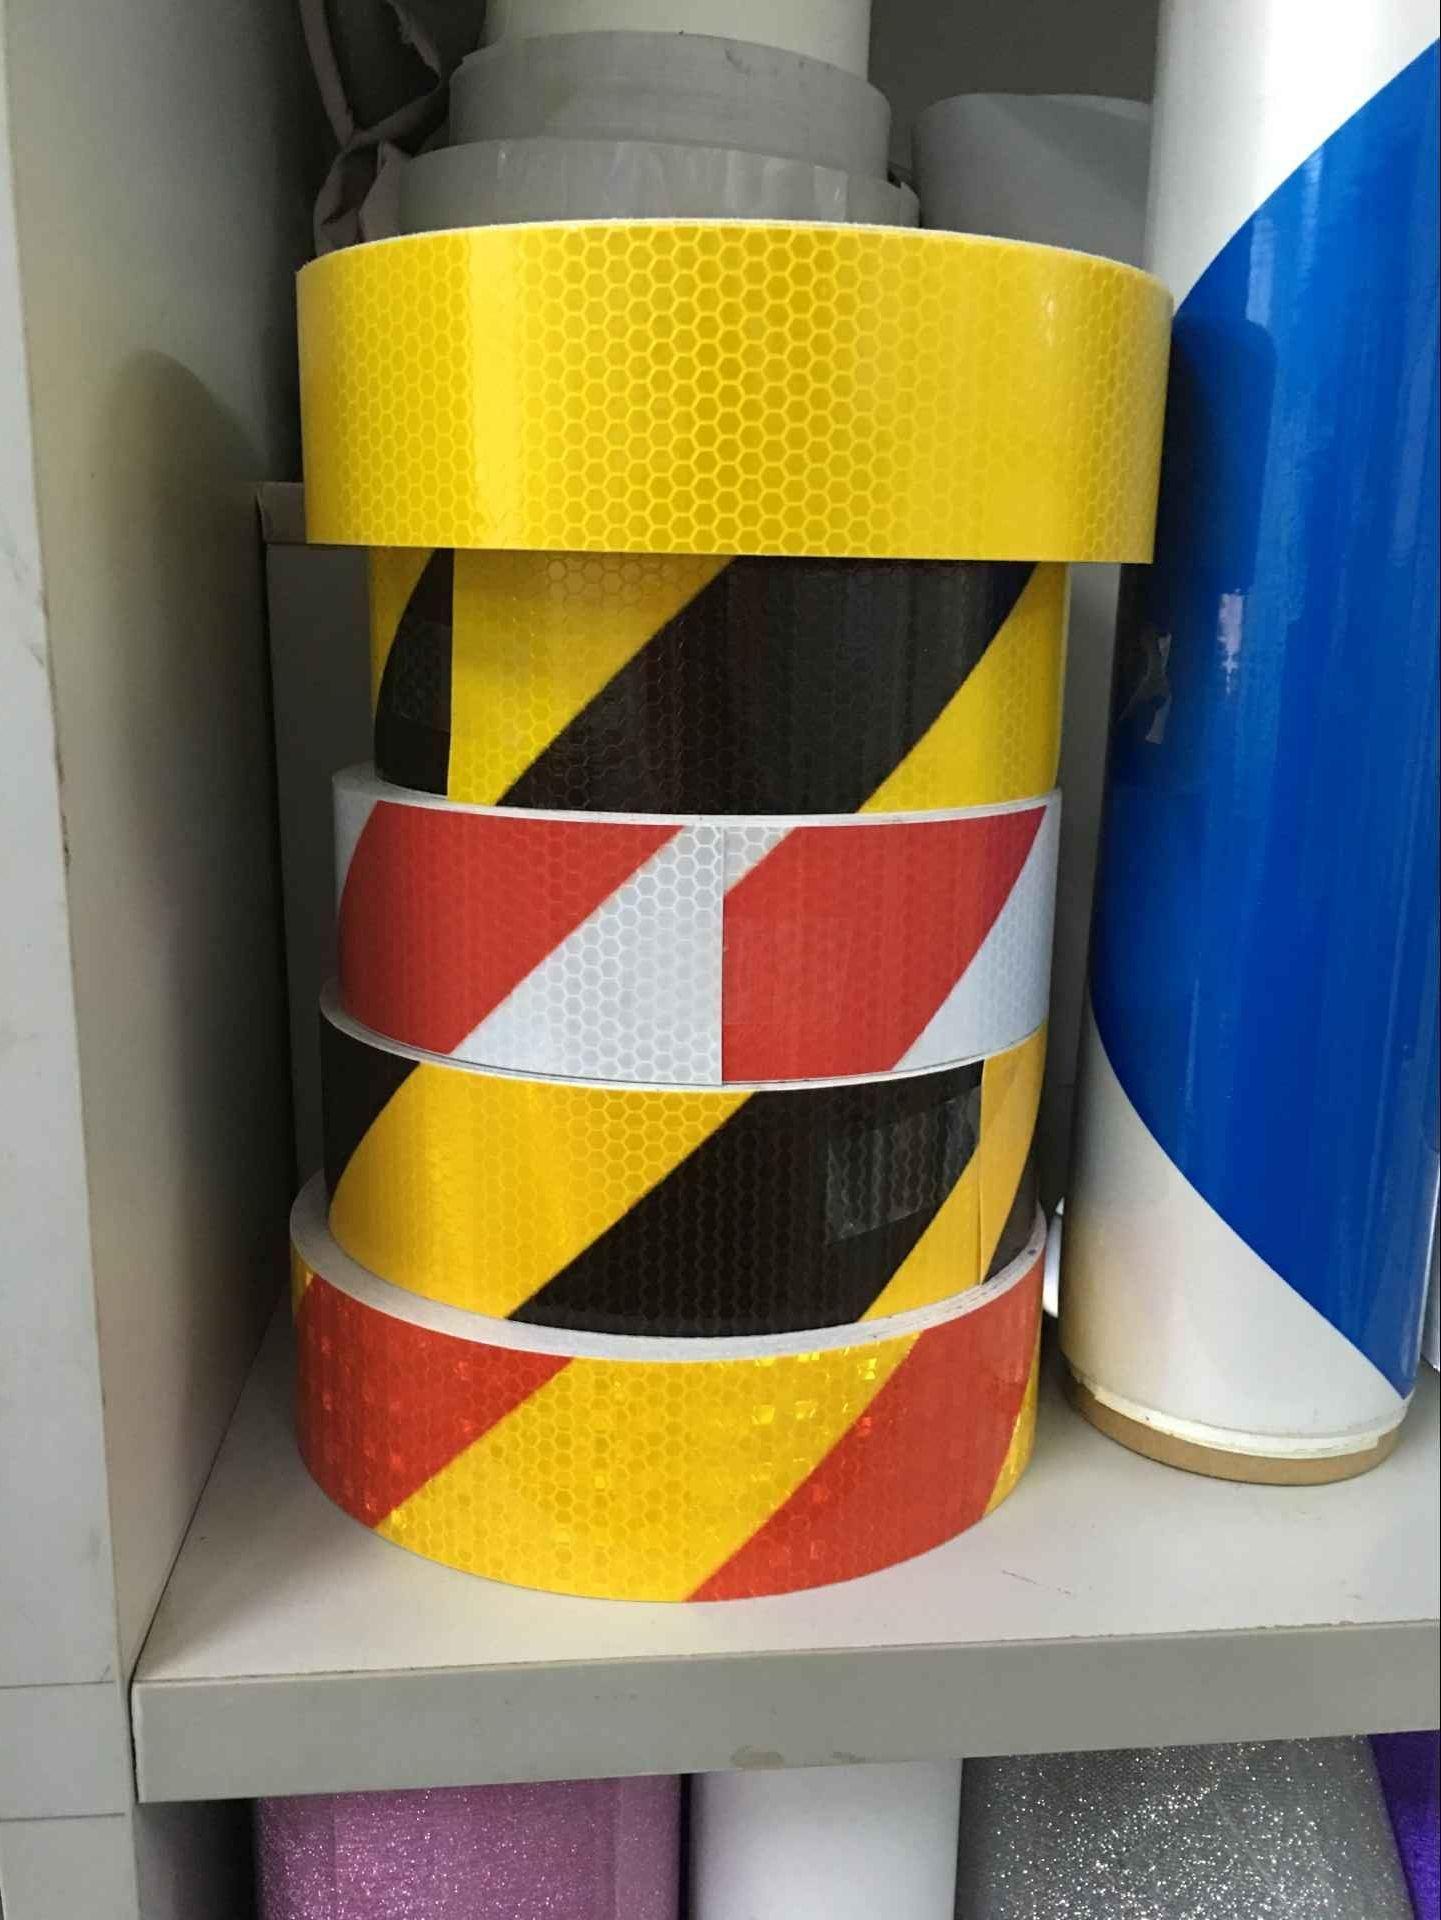 Adhesive Reflective Tape Honeycomb Reflective Marks for Truck Vehicle Warning